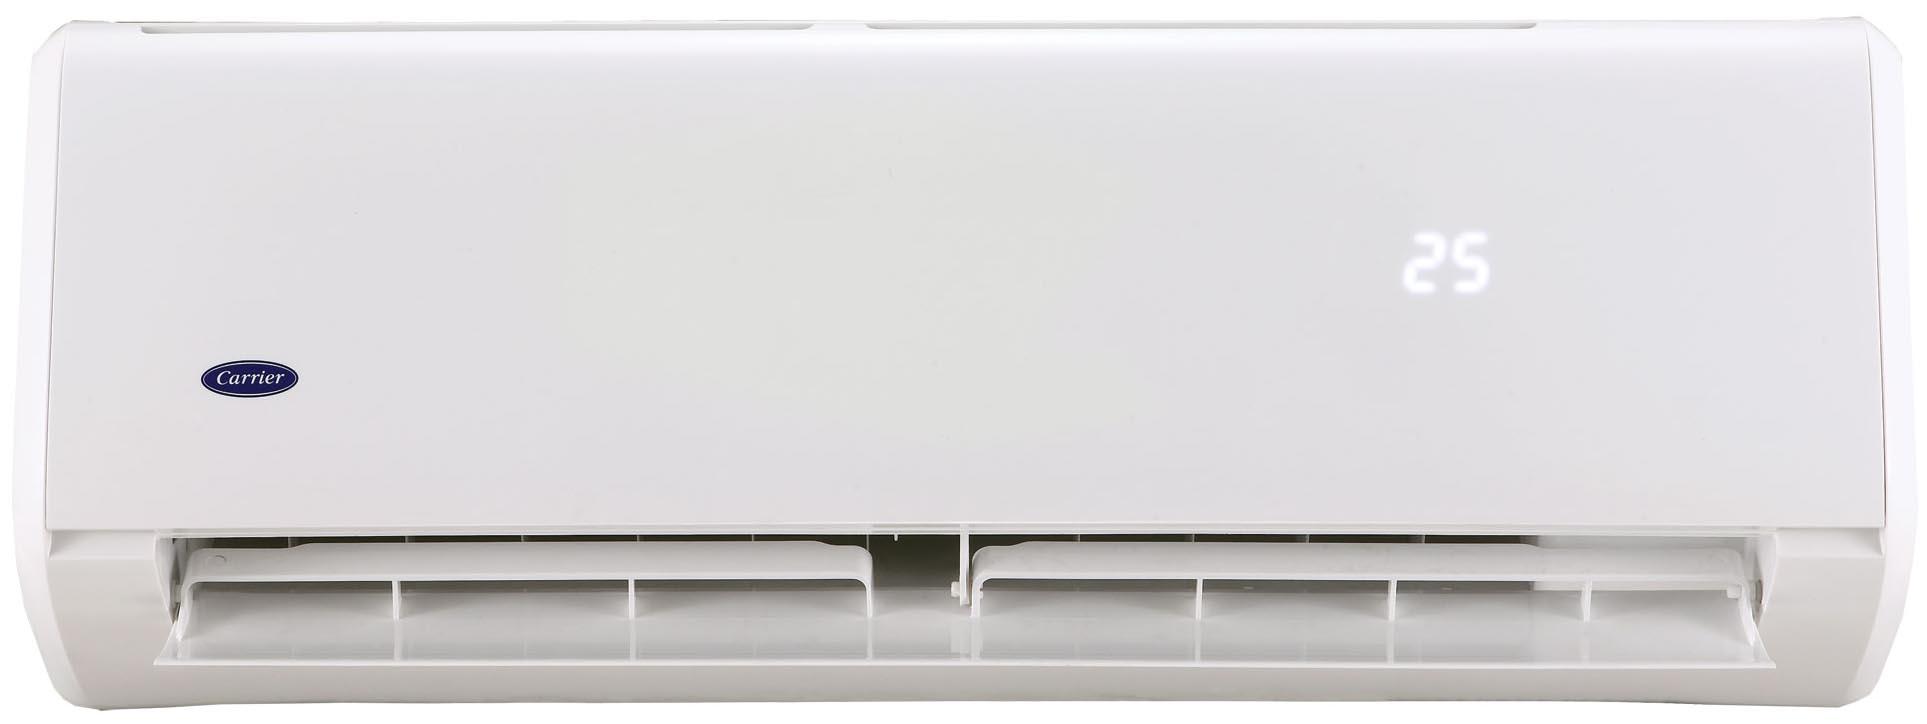 Carrier 42QHC012DS / 38QHC012DS серии Crystal Inverter